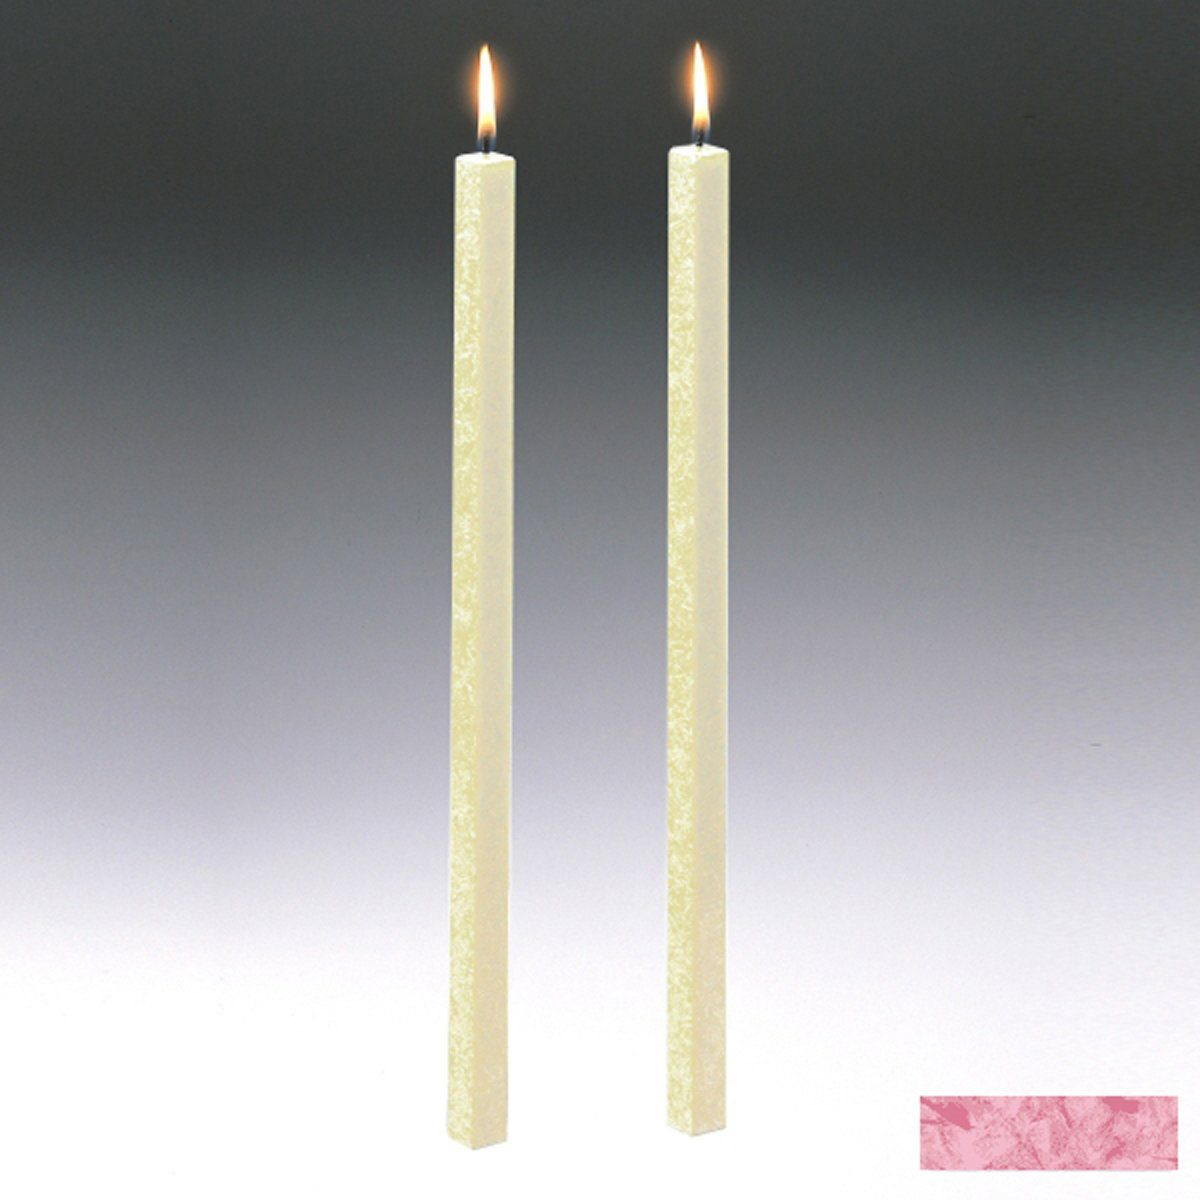 Amabiente Amabiente Kerze CLASSIC Rose 40cm - 2er Set